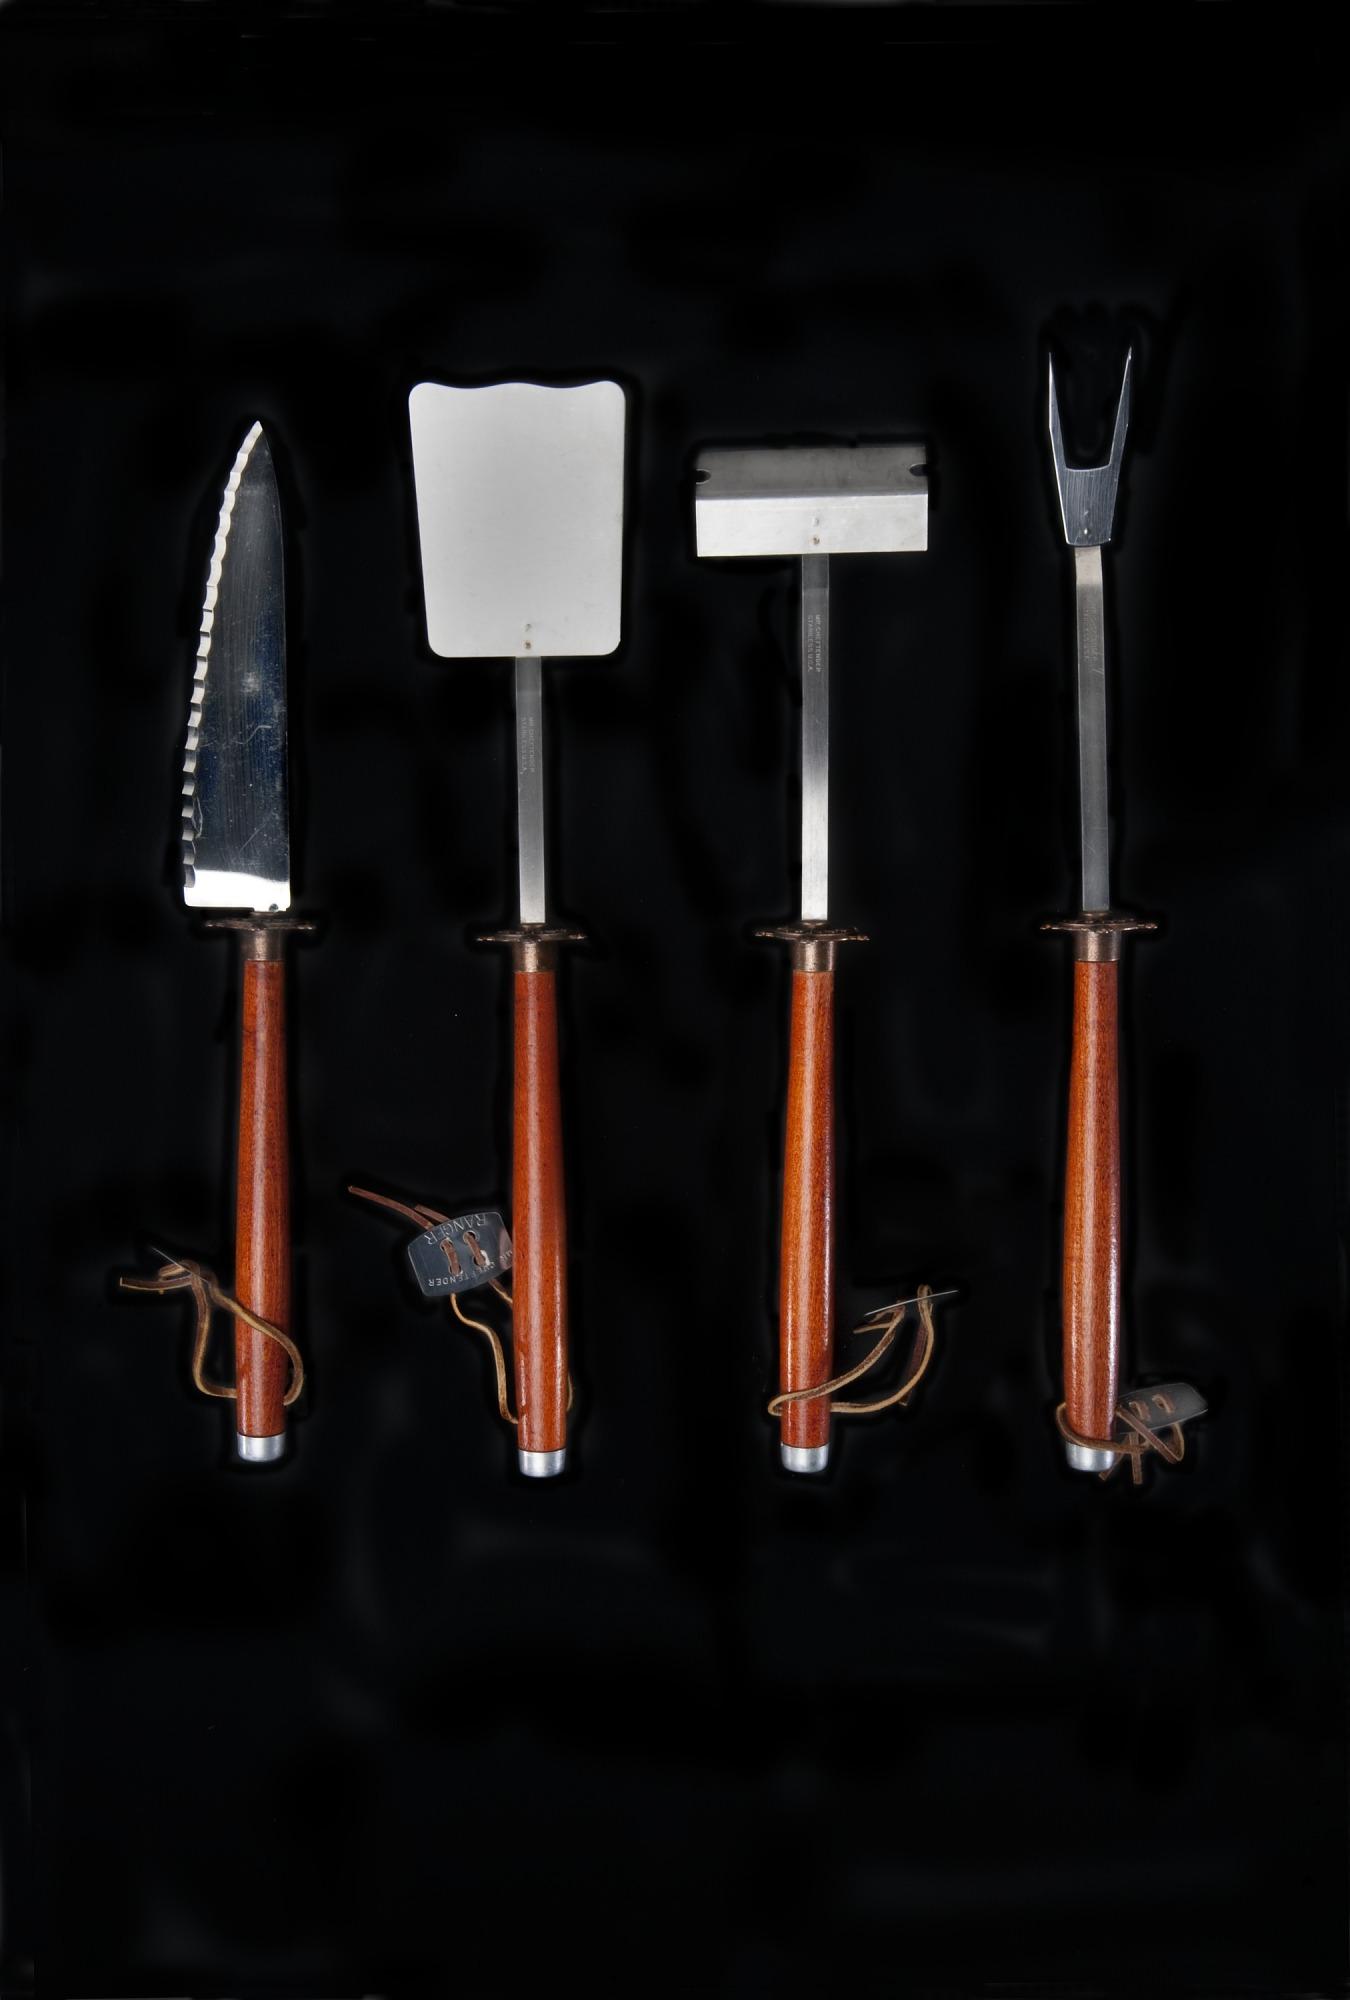 images for Grilling Knife